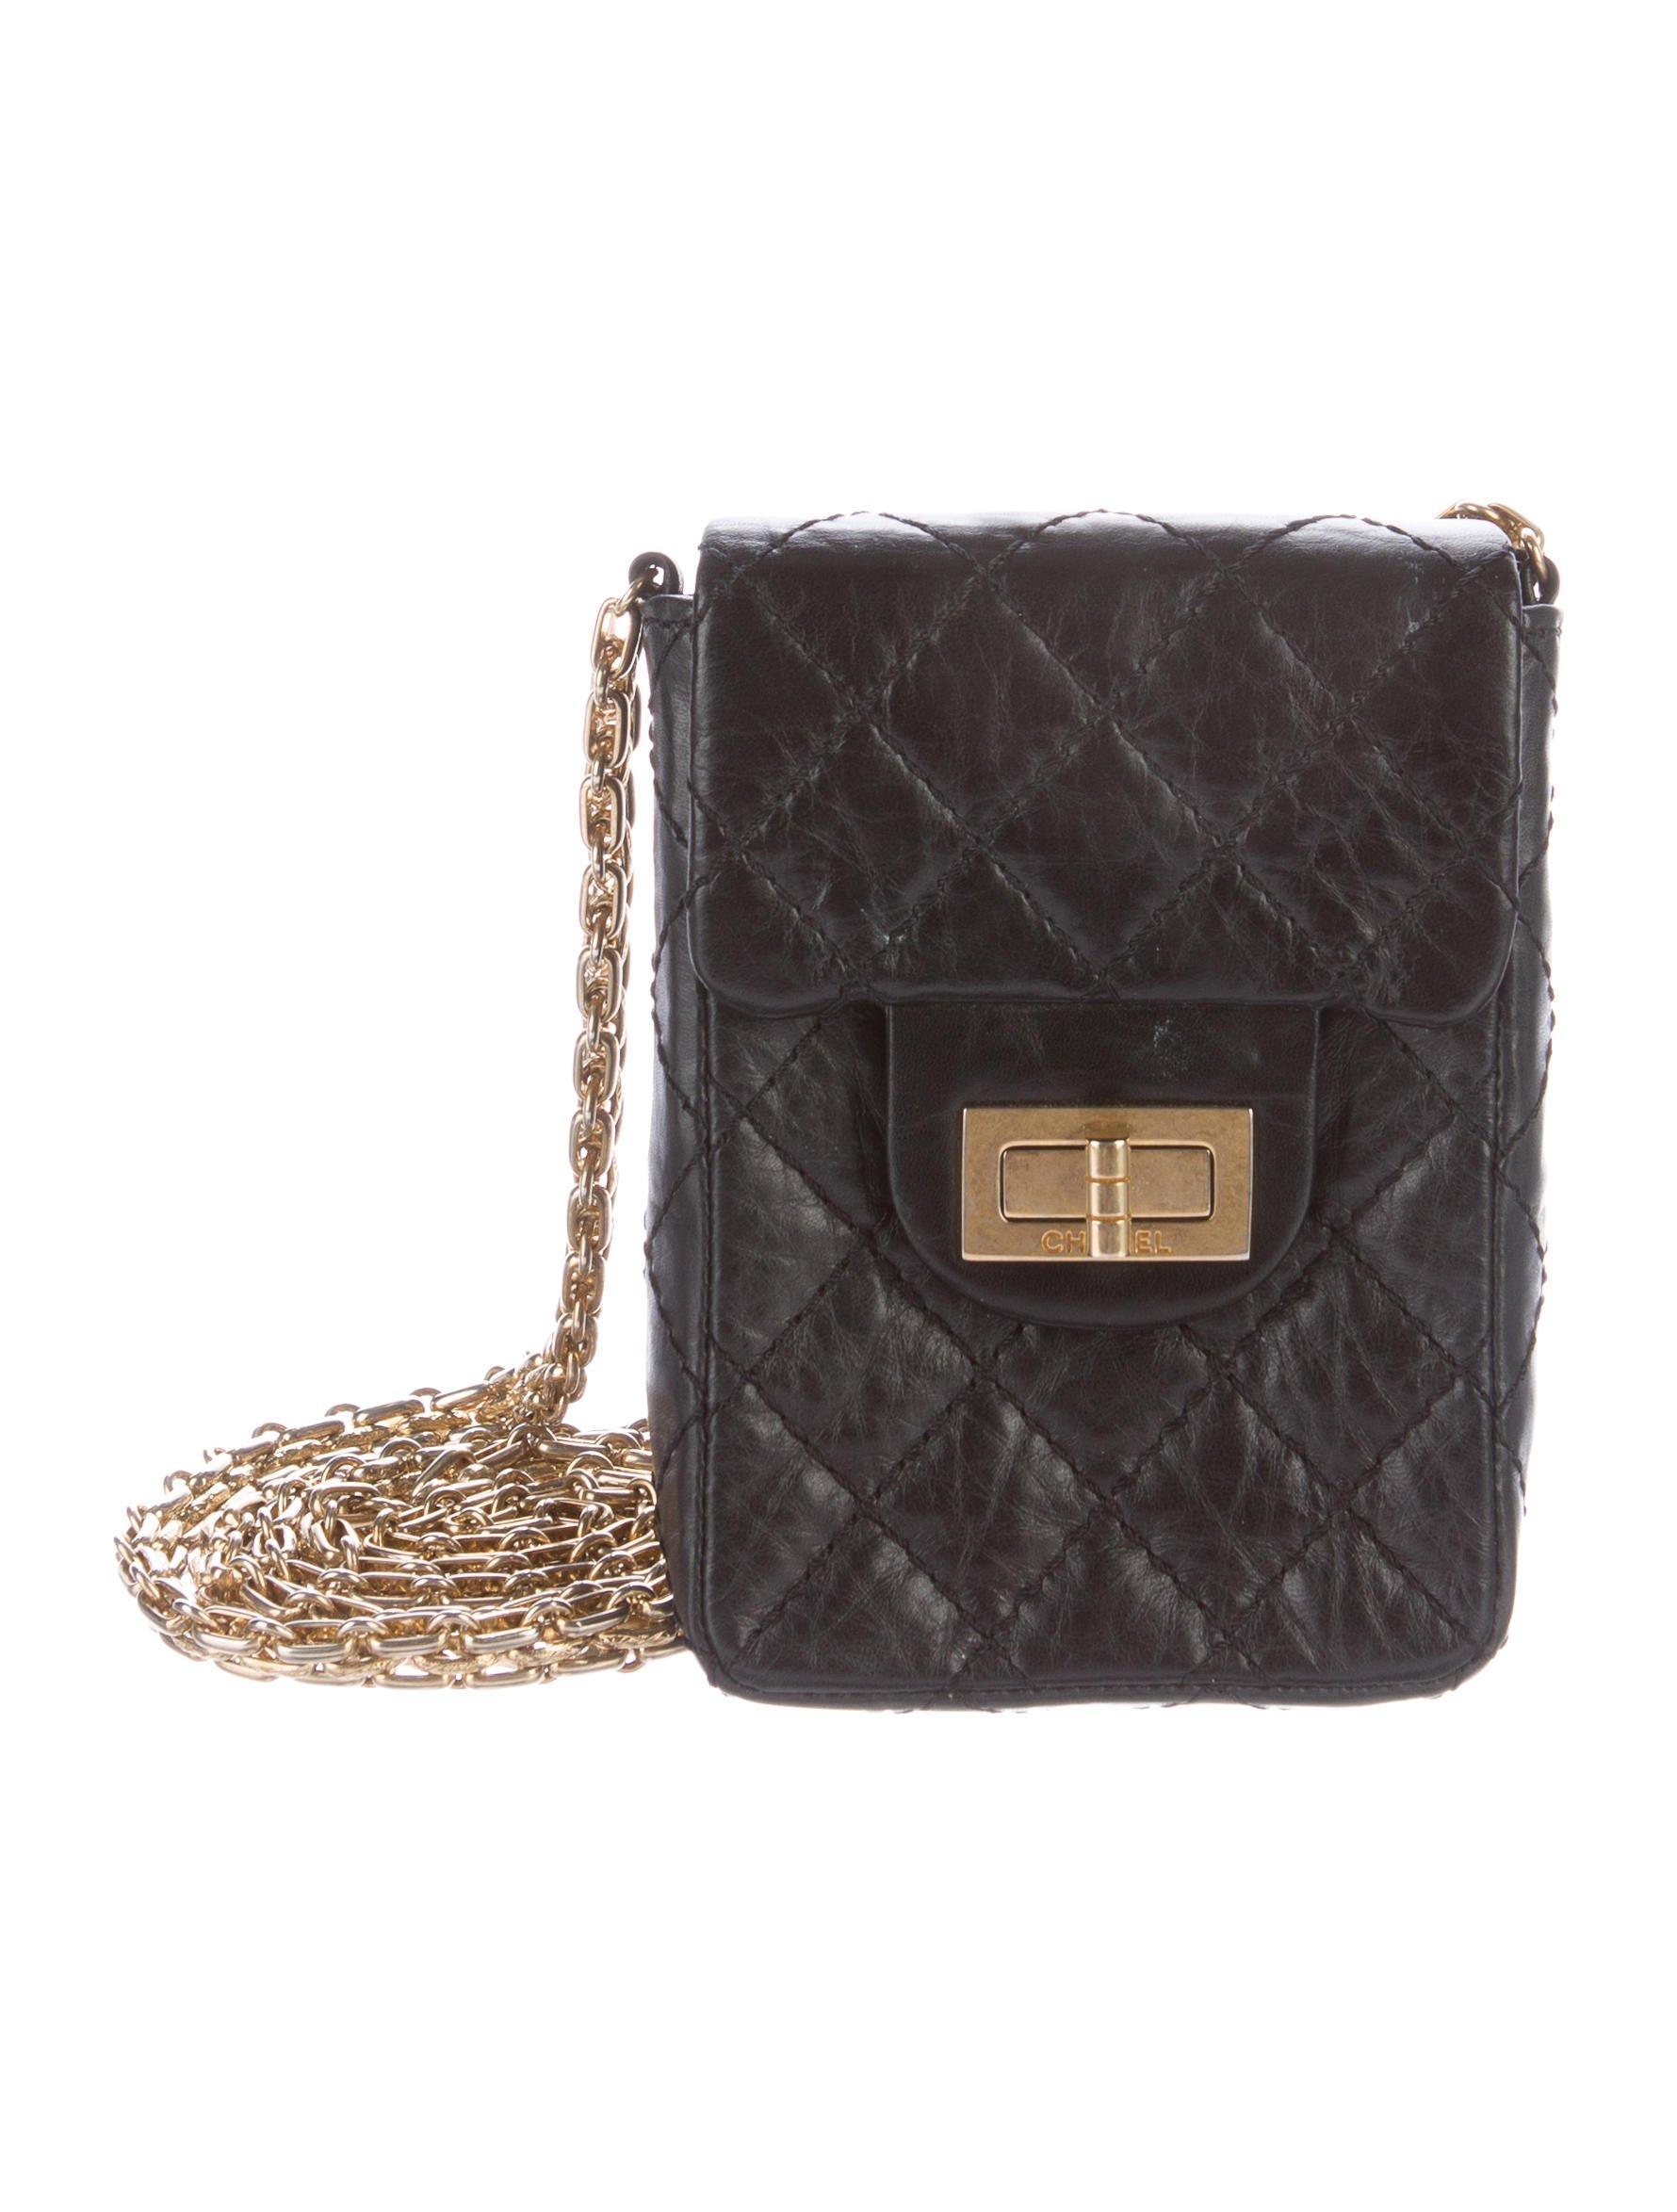 3571e9a5983c Lyst - Chanel 2.55 Reissue Crossbody Phone Holder Black in Metallic